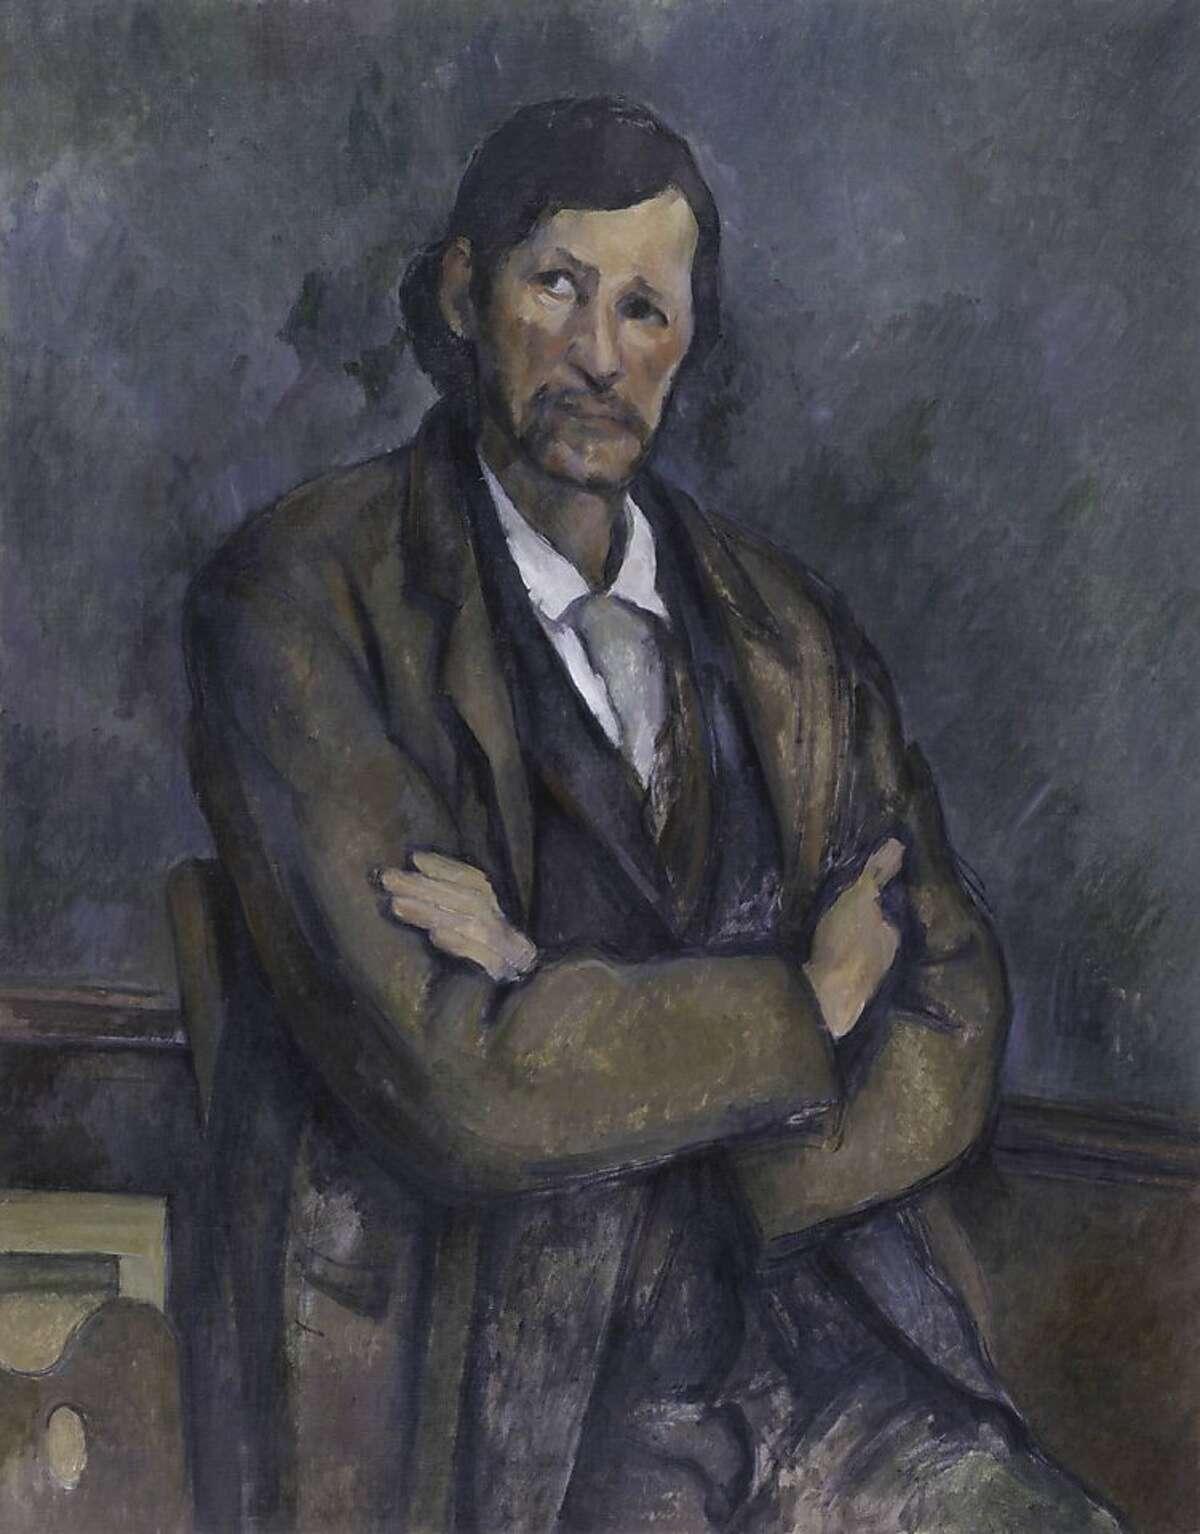 Paul Cézanne, Man with Crossed Arms (Homme aux bras croisés), ca. 1899. Oil on canvas, 36 π x 28 5/8 inches (92 x 72.7 cm). Solomon R. Guggenheim Museum, New York 54.1387